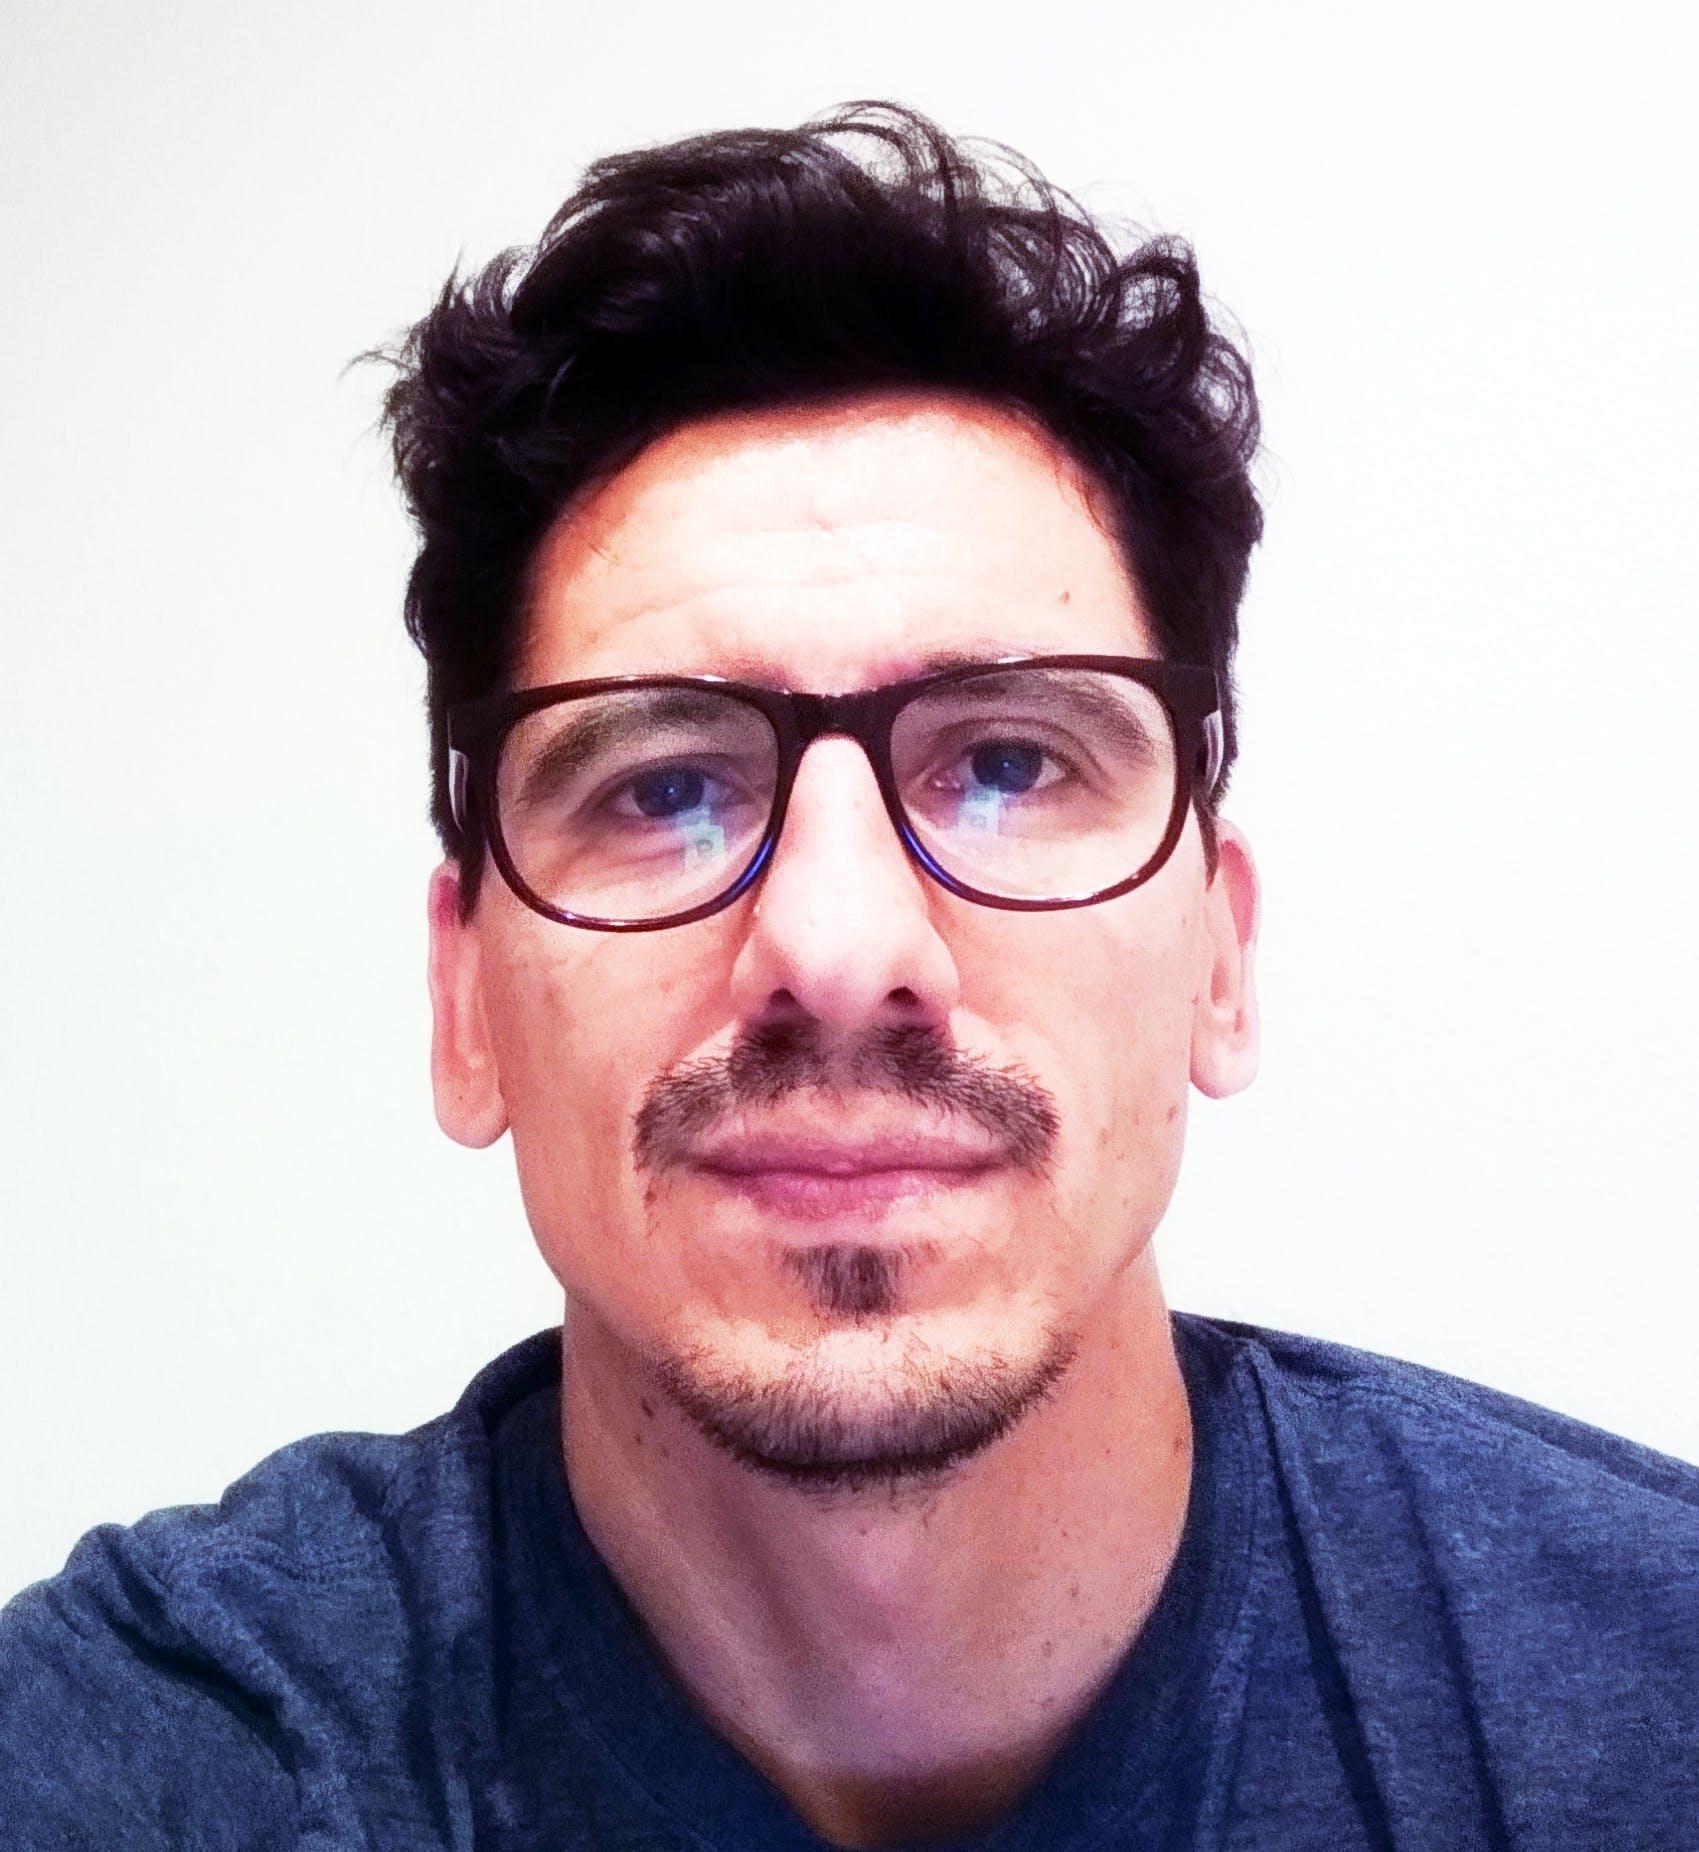 Ironhack UX/UI design instructor Edu Huerta